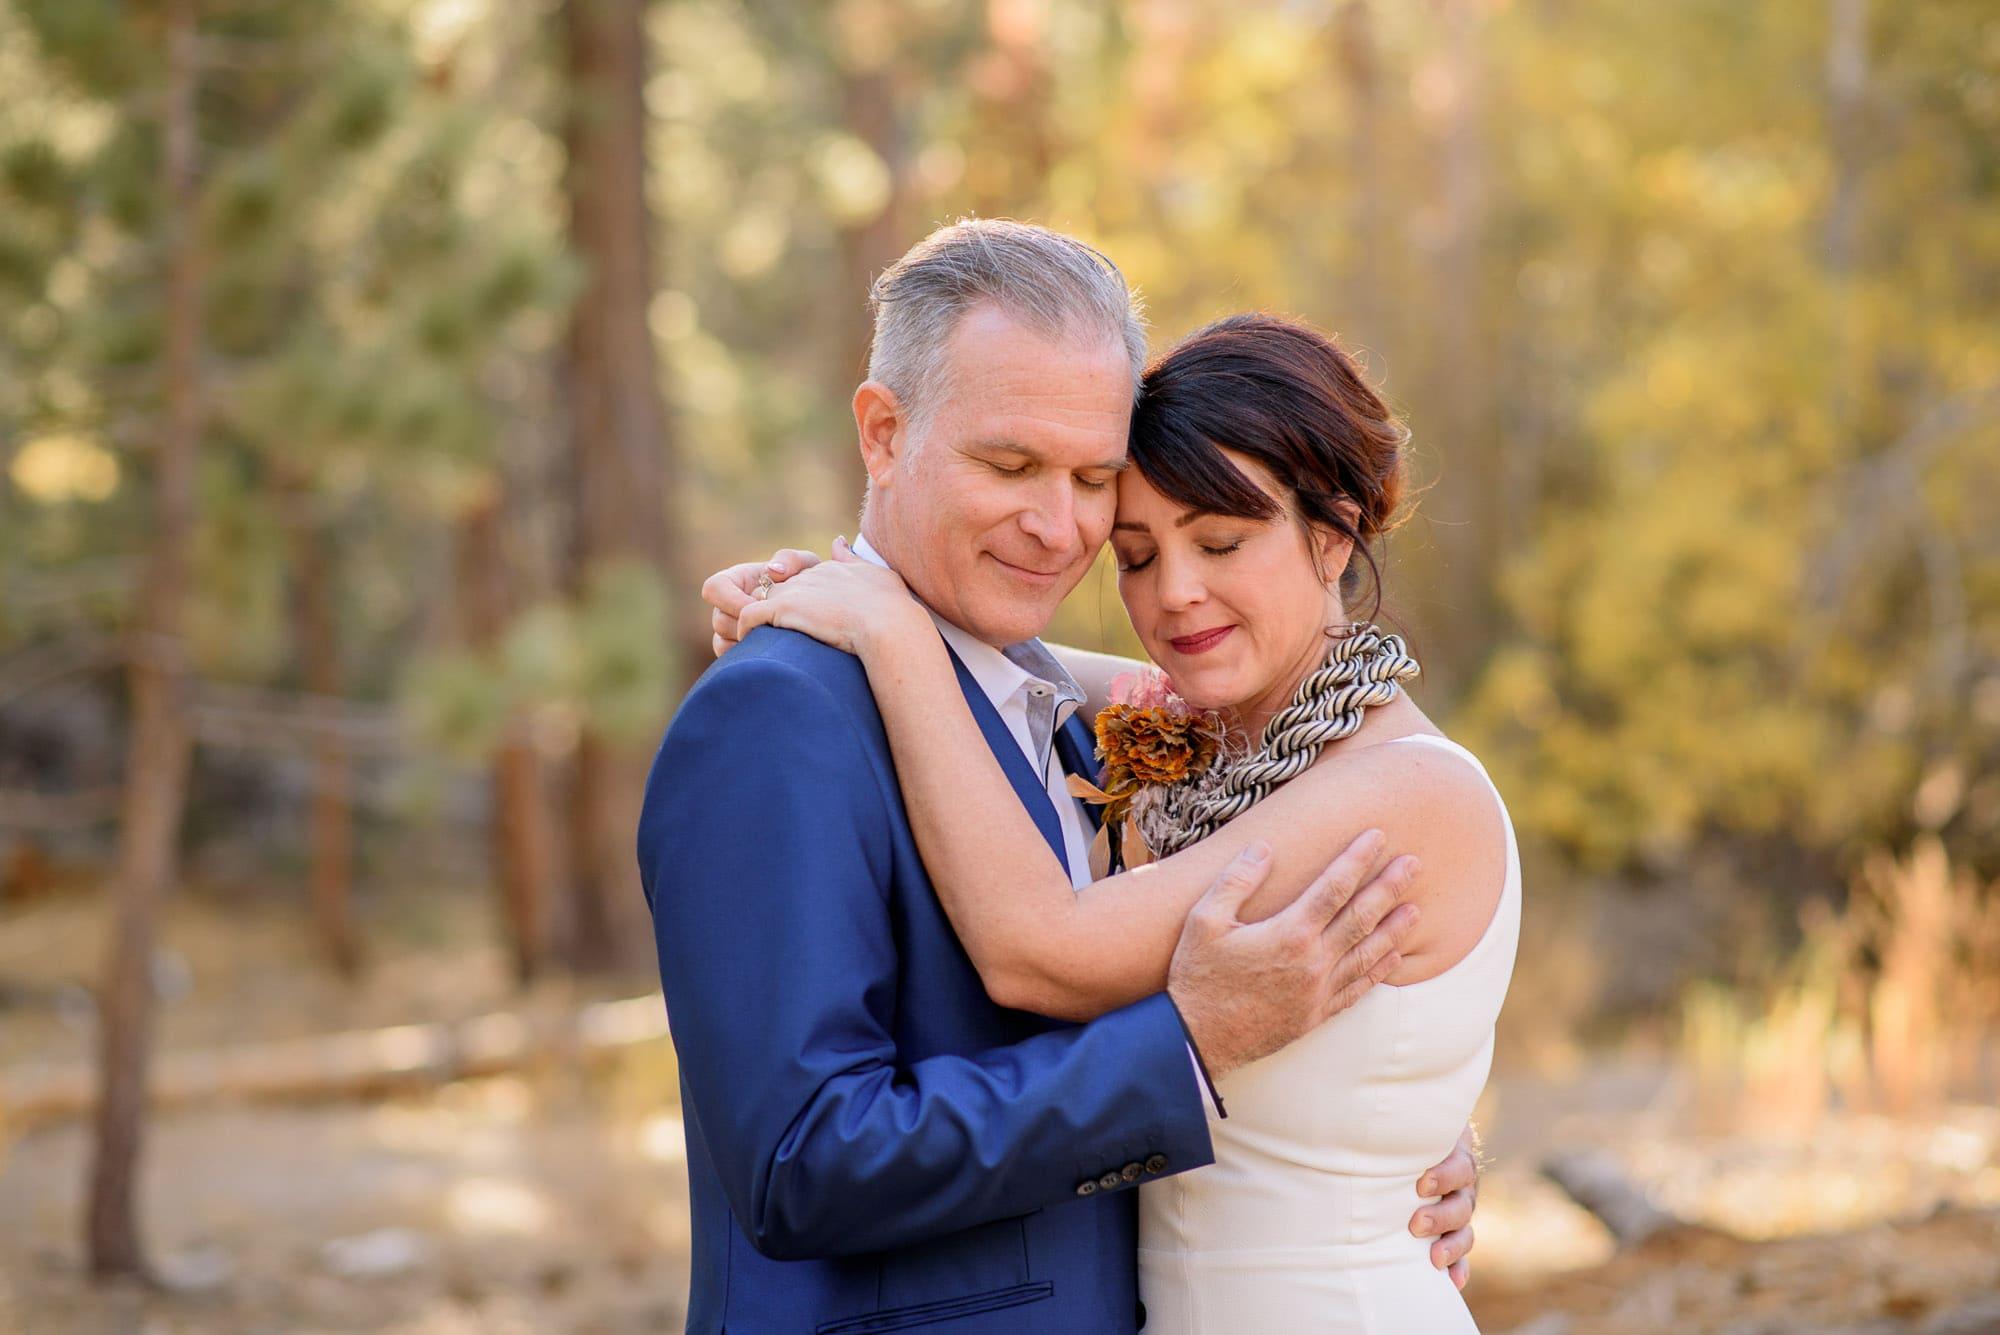 028_Alan_and_Heidi_Palm_Springs_Tram_Wedding